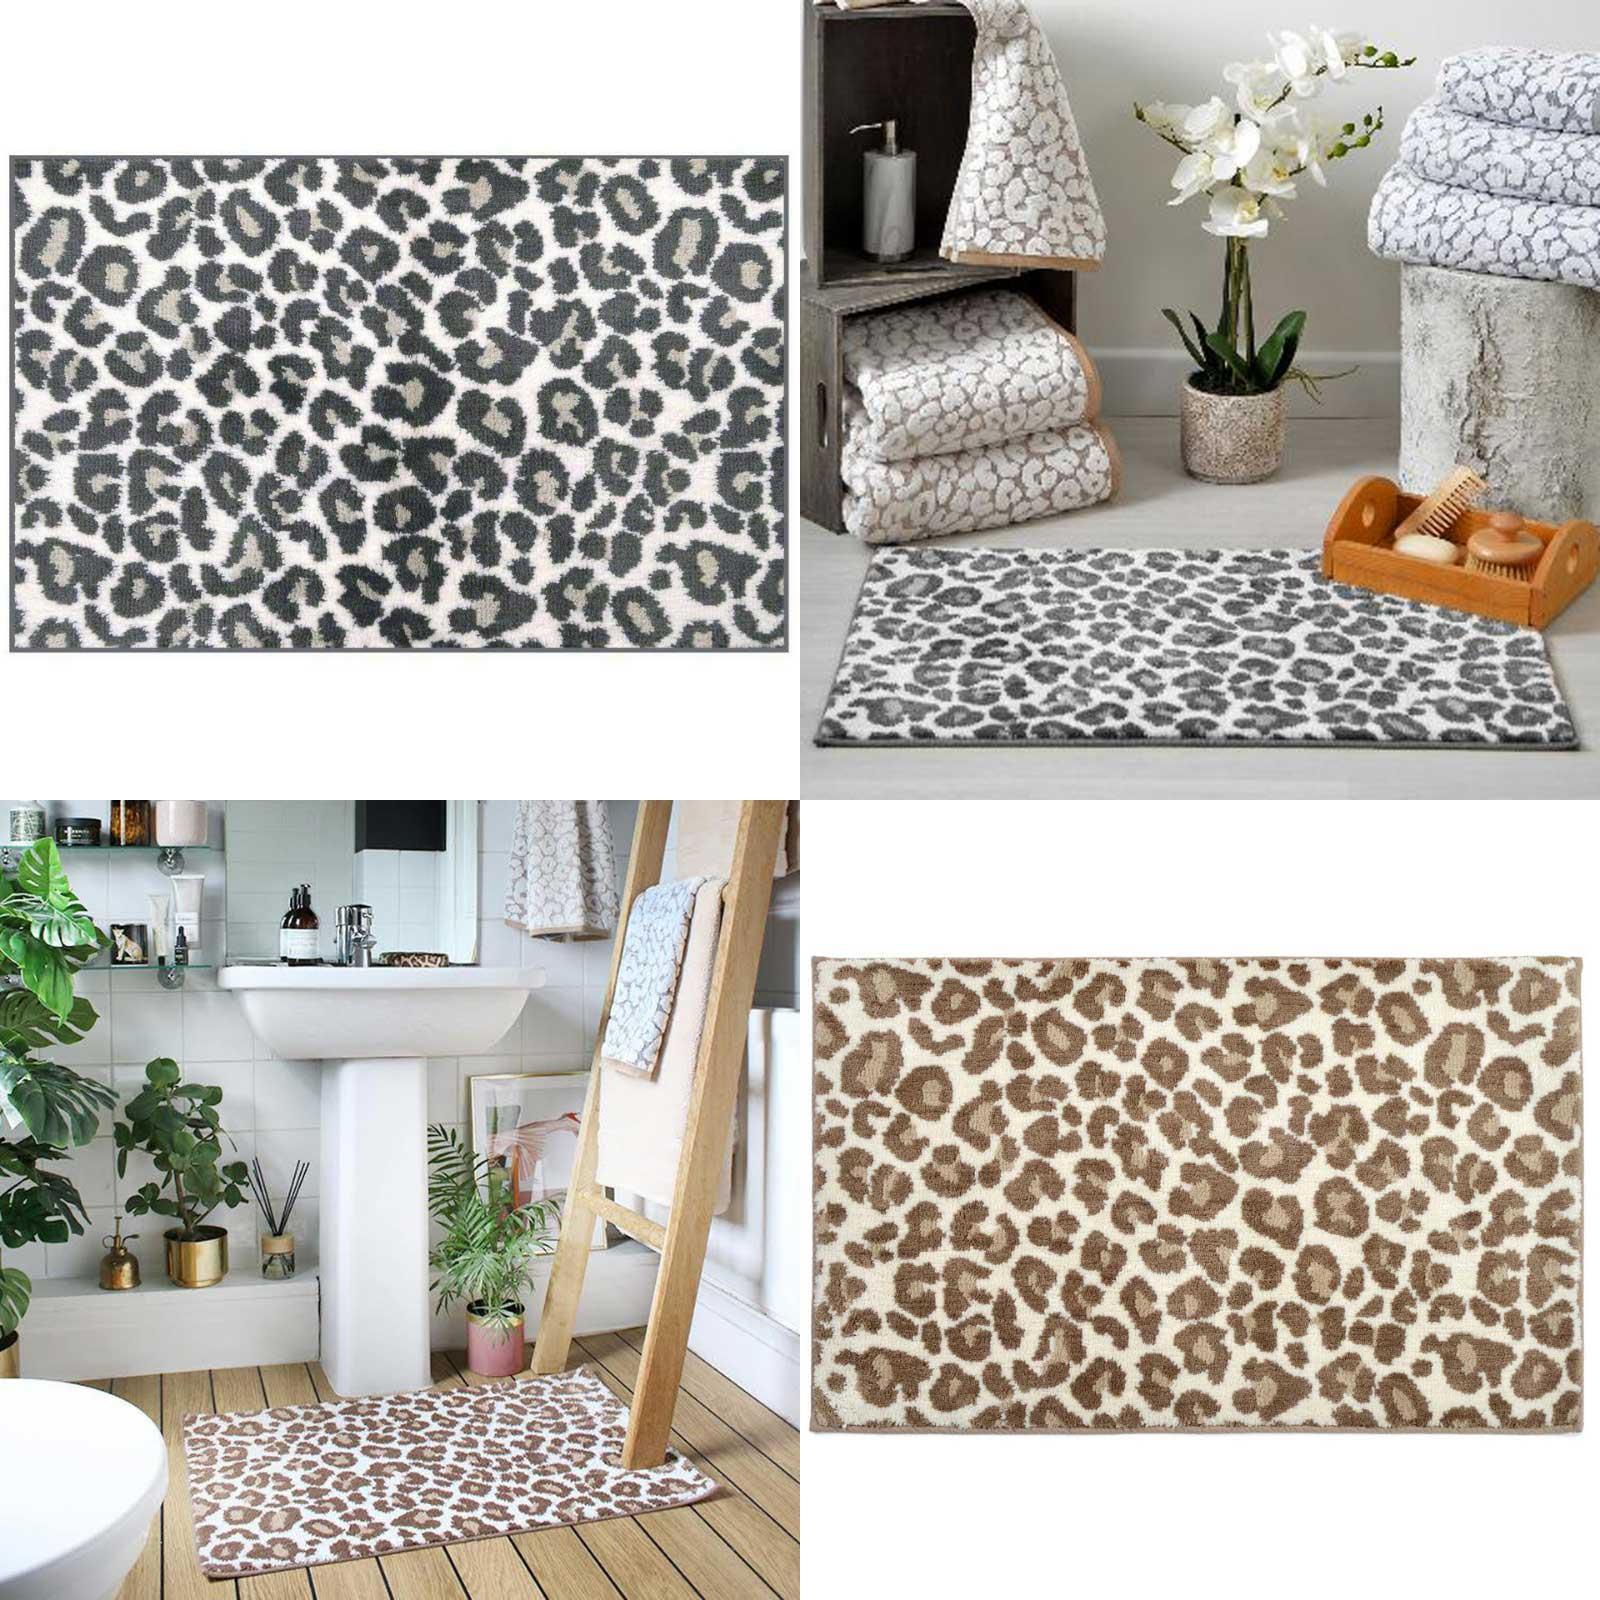 Leopard Print Bath Mat Non Slip Super Soft Absorbent Animal Bathroom Shower Mats Ebay